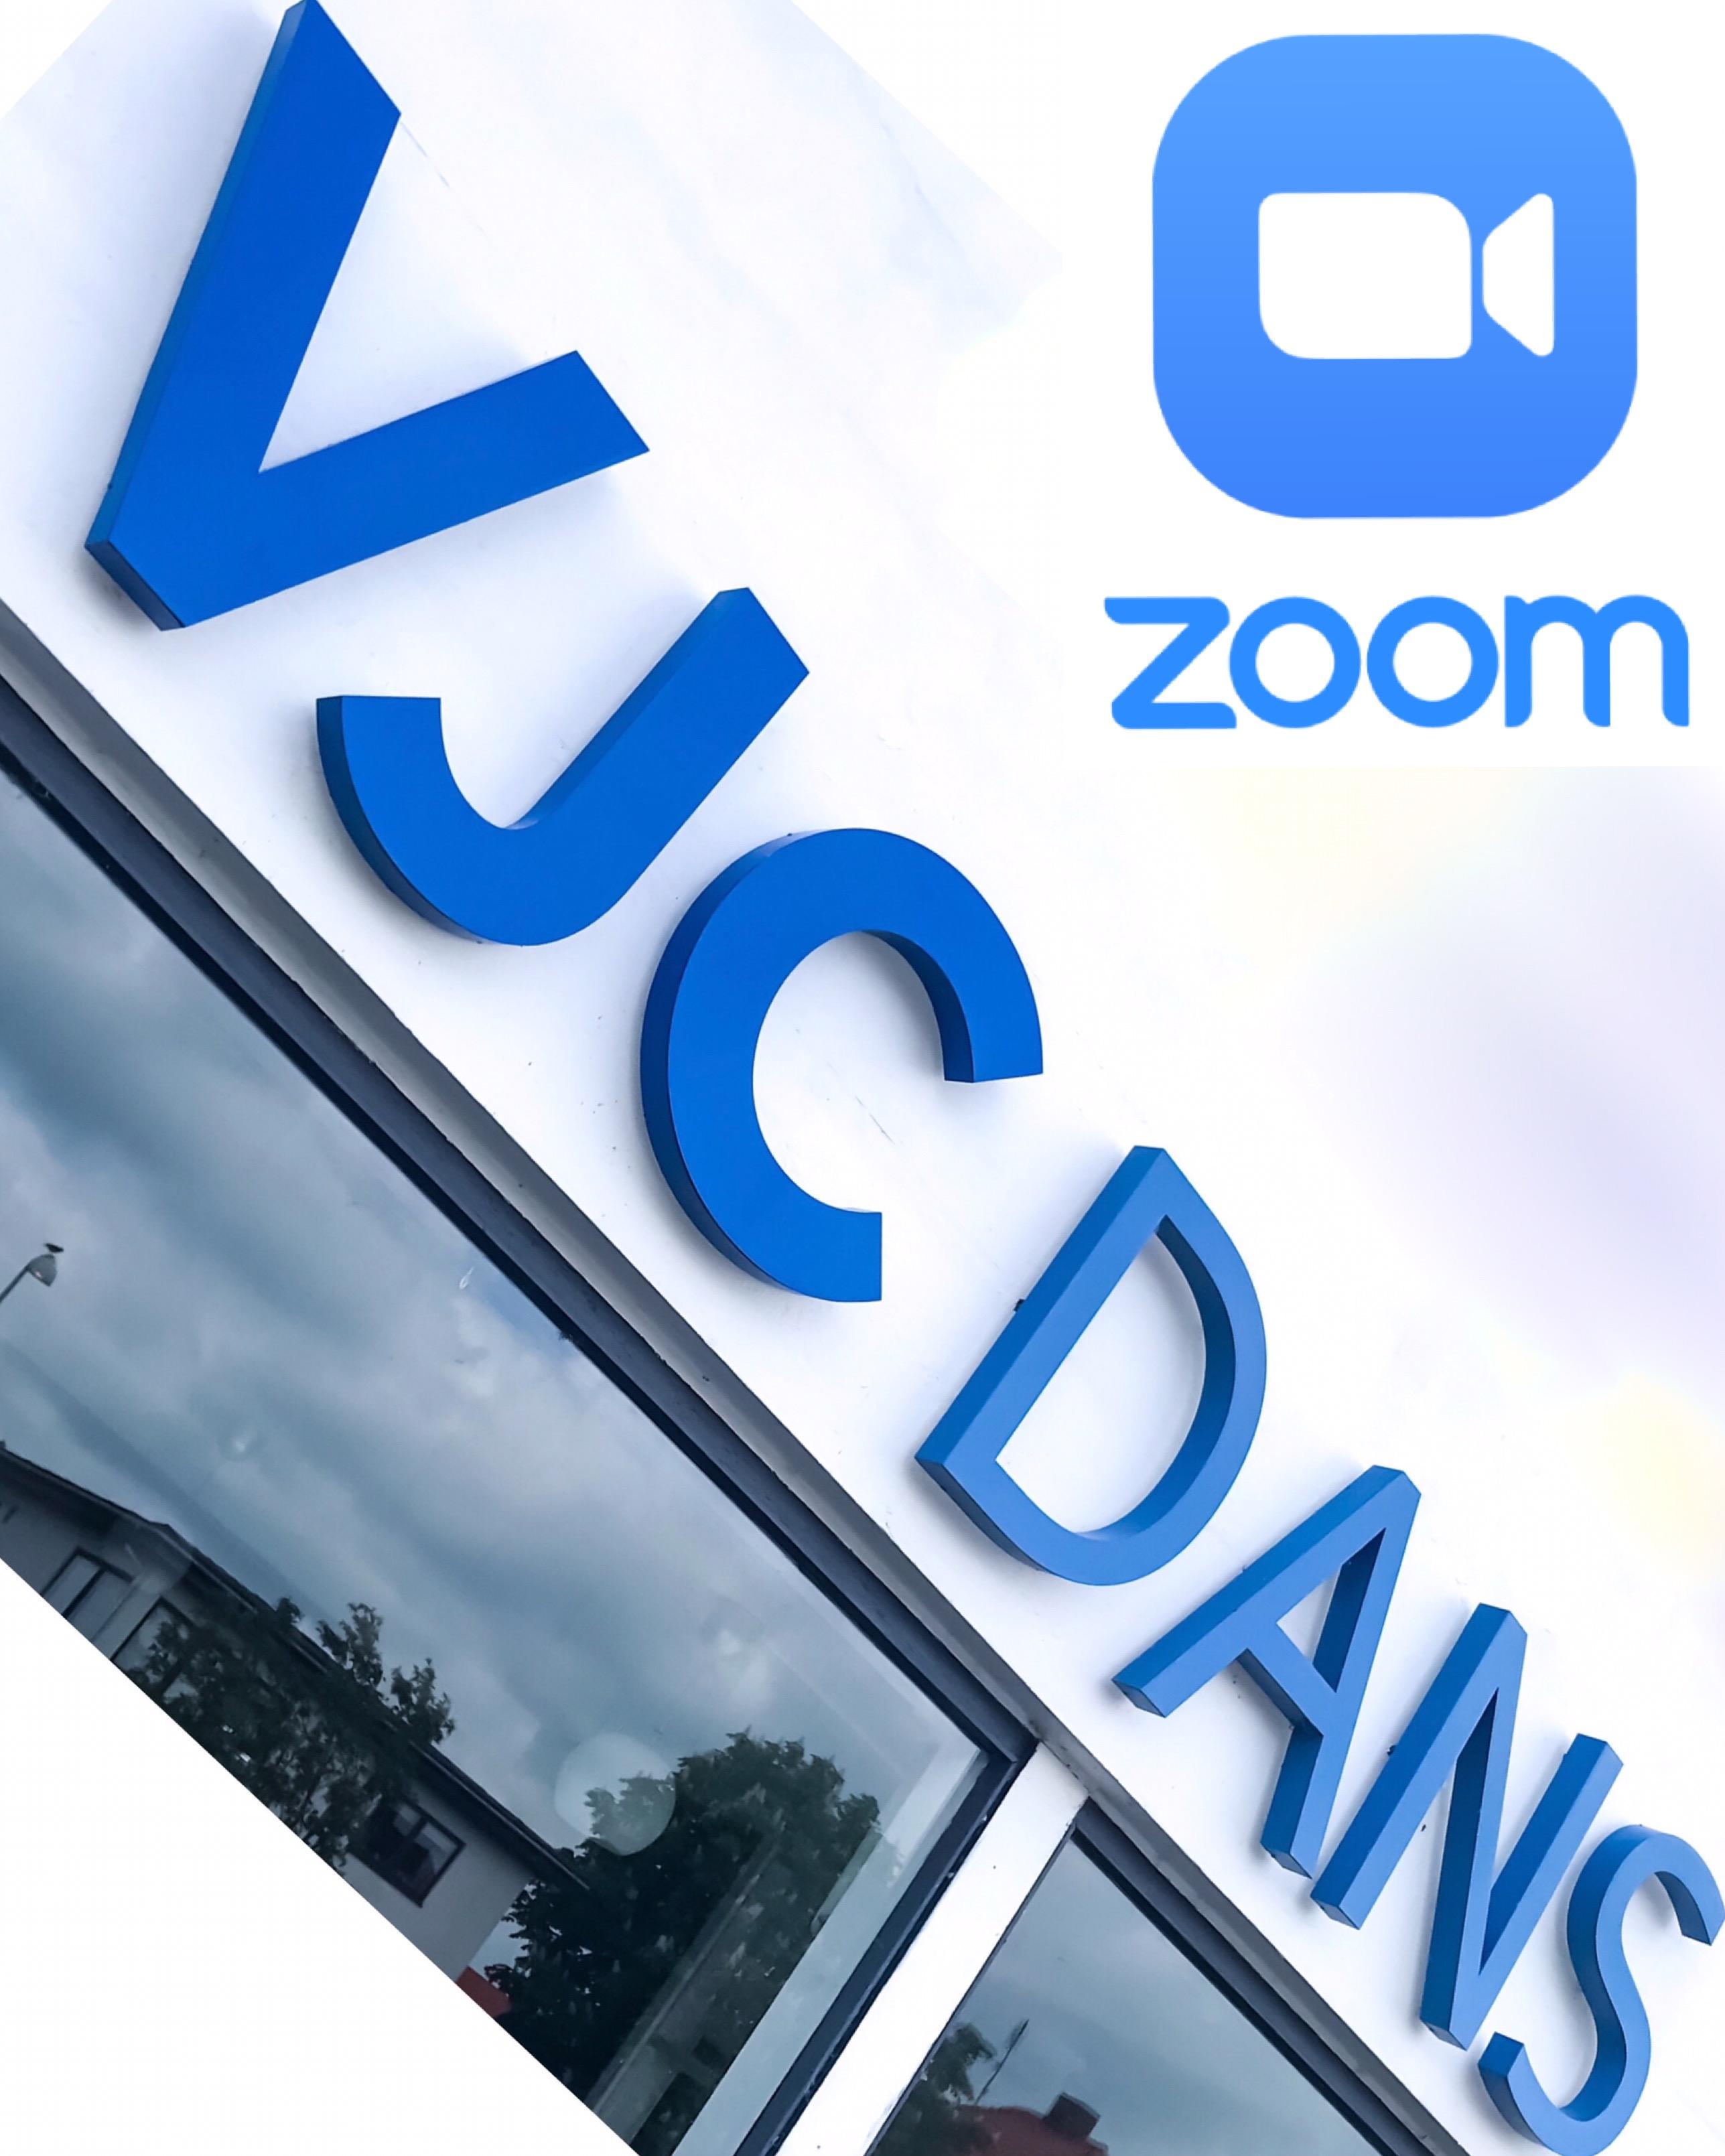 Online Danseskole – VJCDANS åbner online på ZOOM